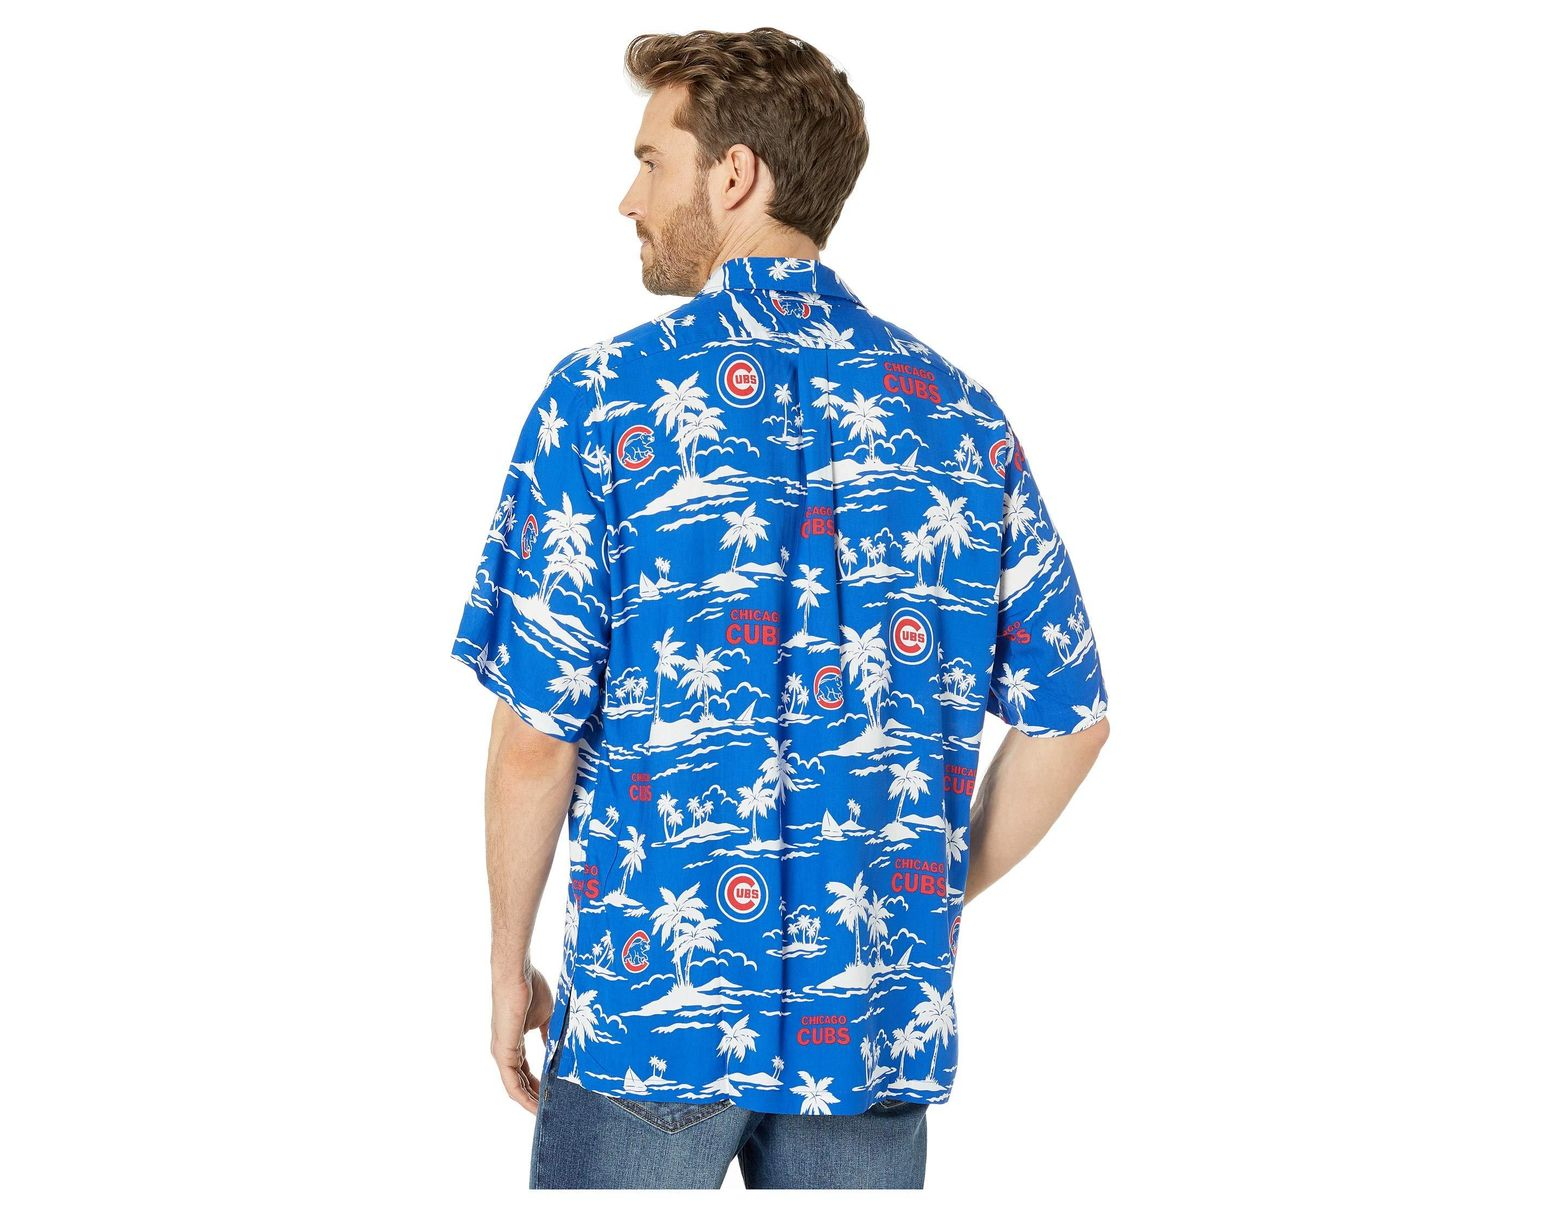 7f8c6cdd4 Reyn Spooner Chicago Cubs Vintage Rayon Shirt (blue) Men's Clothing in Blue  for Men - Lyst